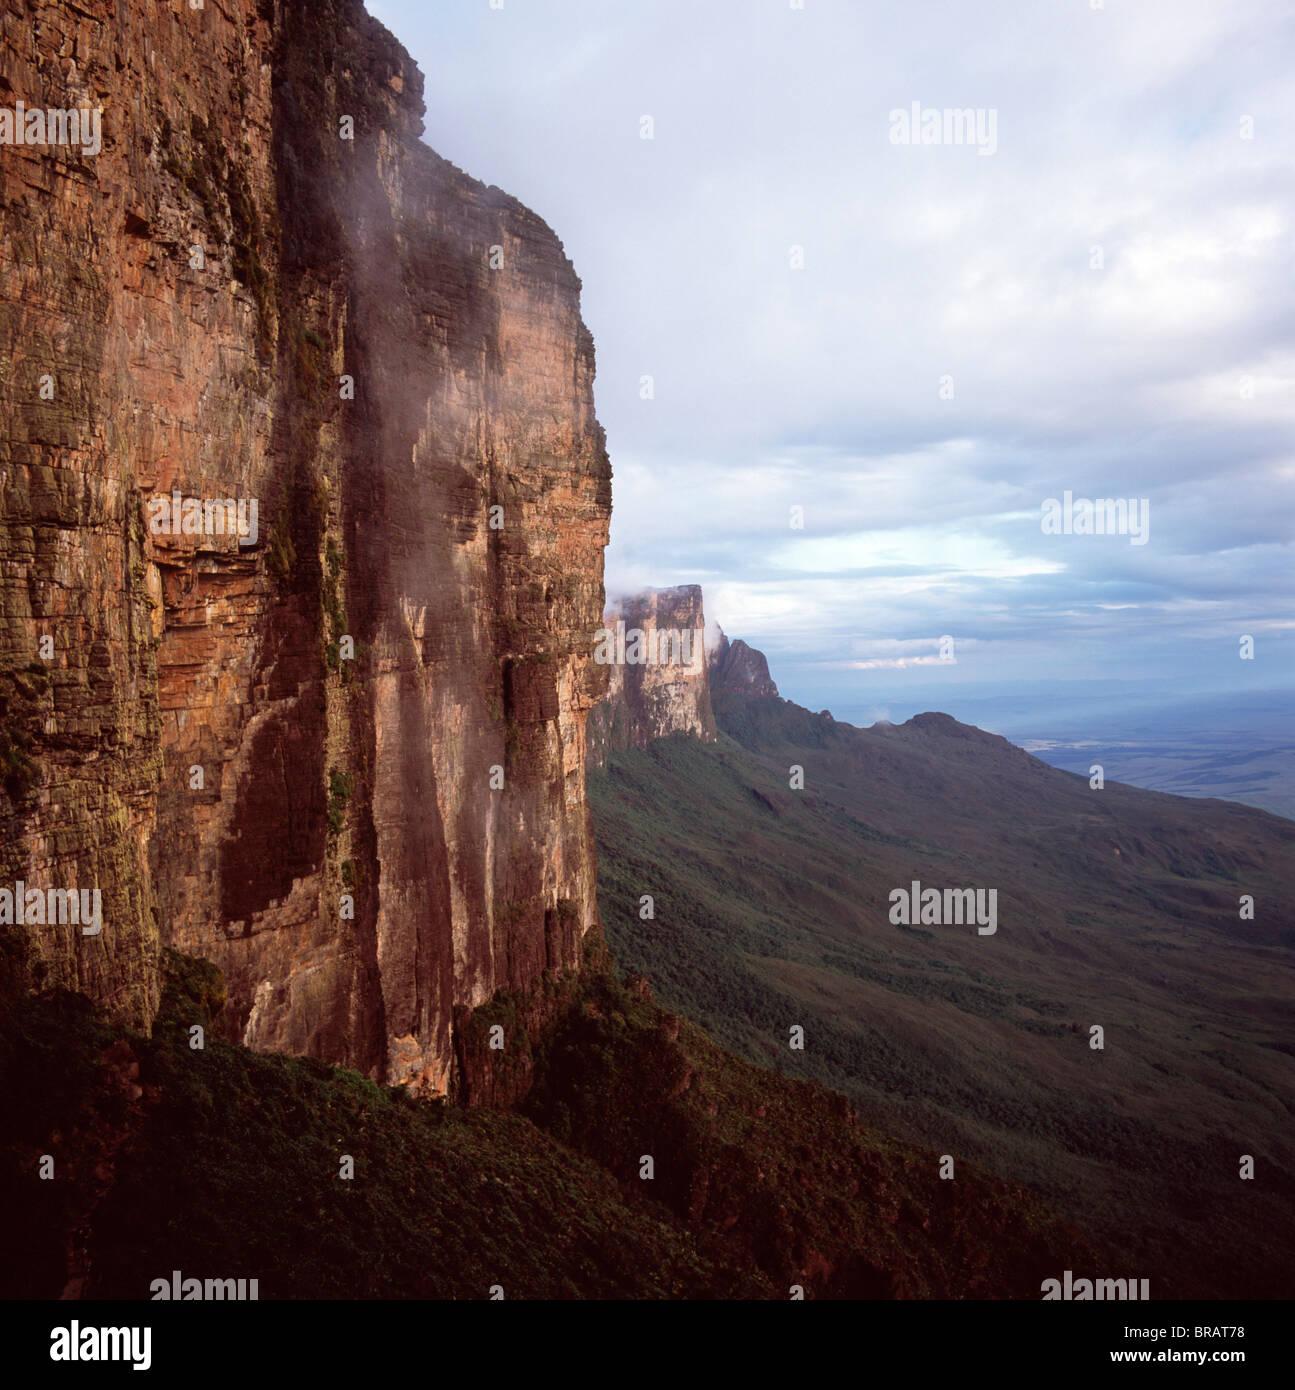 Southwestern cliff from ascent ledge, Mount Roraima (Cerro Roraima), Tepuis, Estado Bolivar, Venezuela, South America - Stock Image